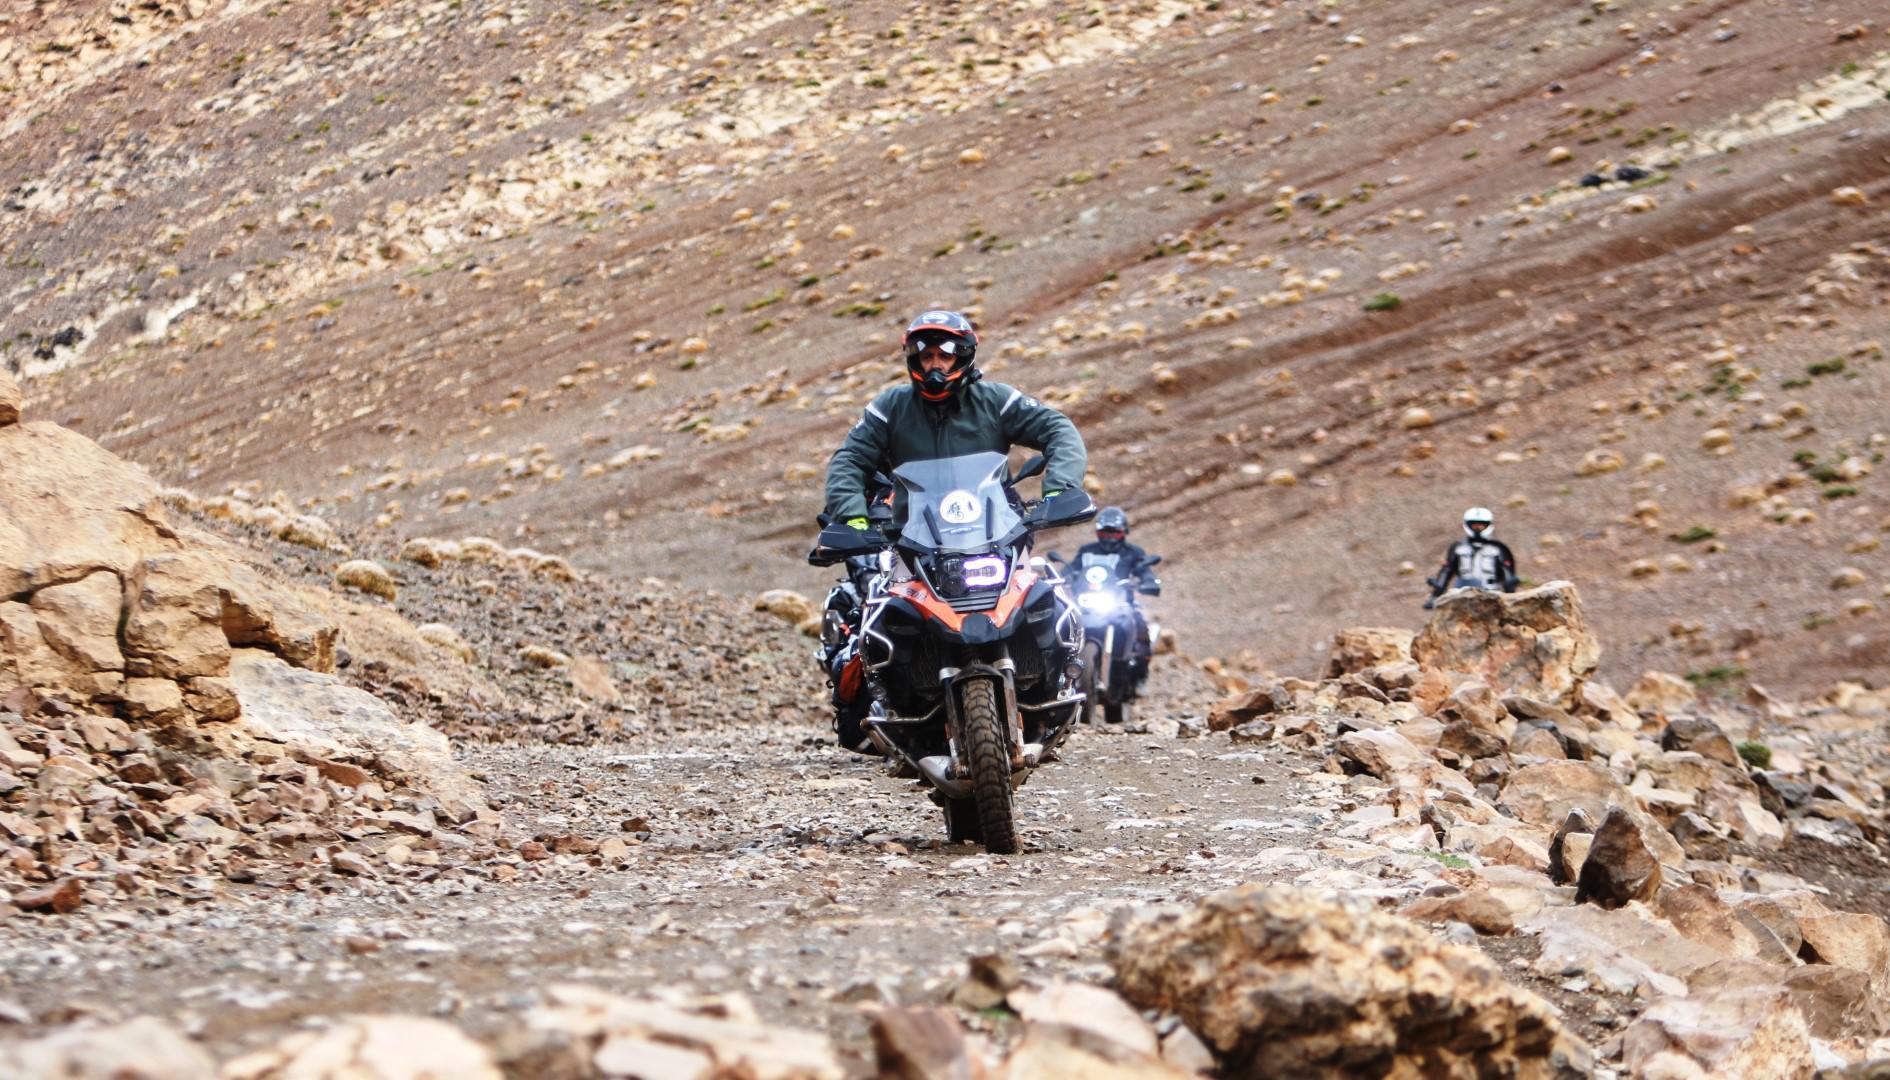 le-morocco-tizi-challenge-est-en-piste-1257-9.jpg